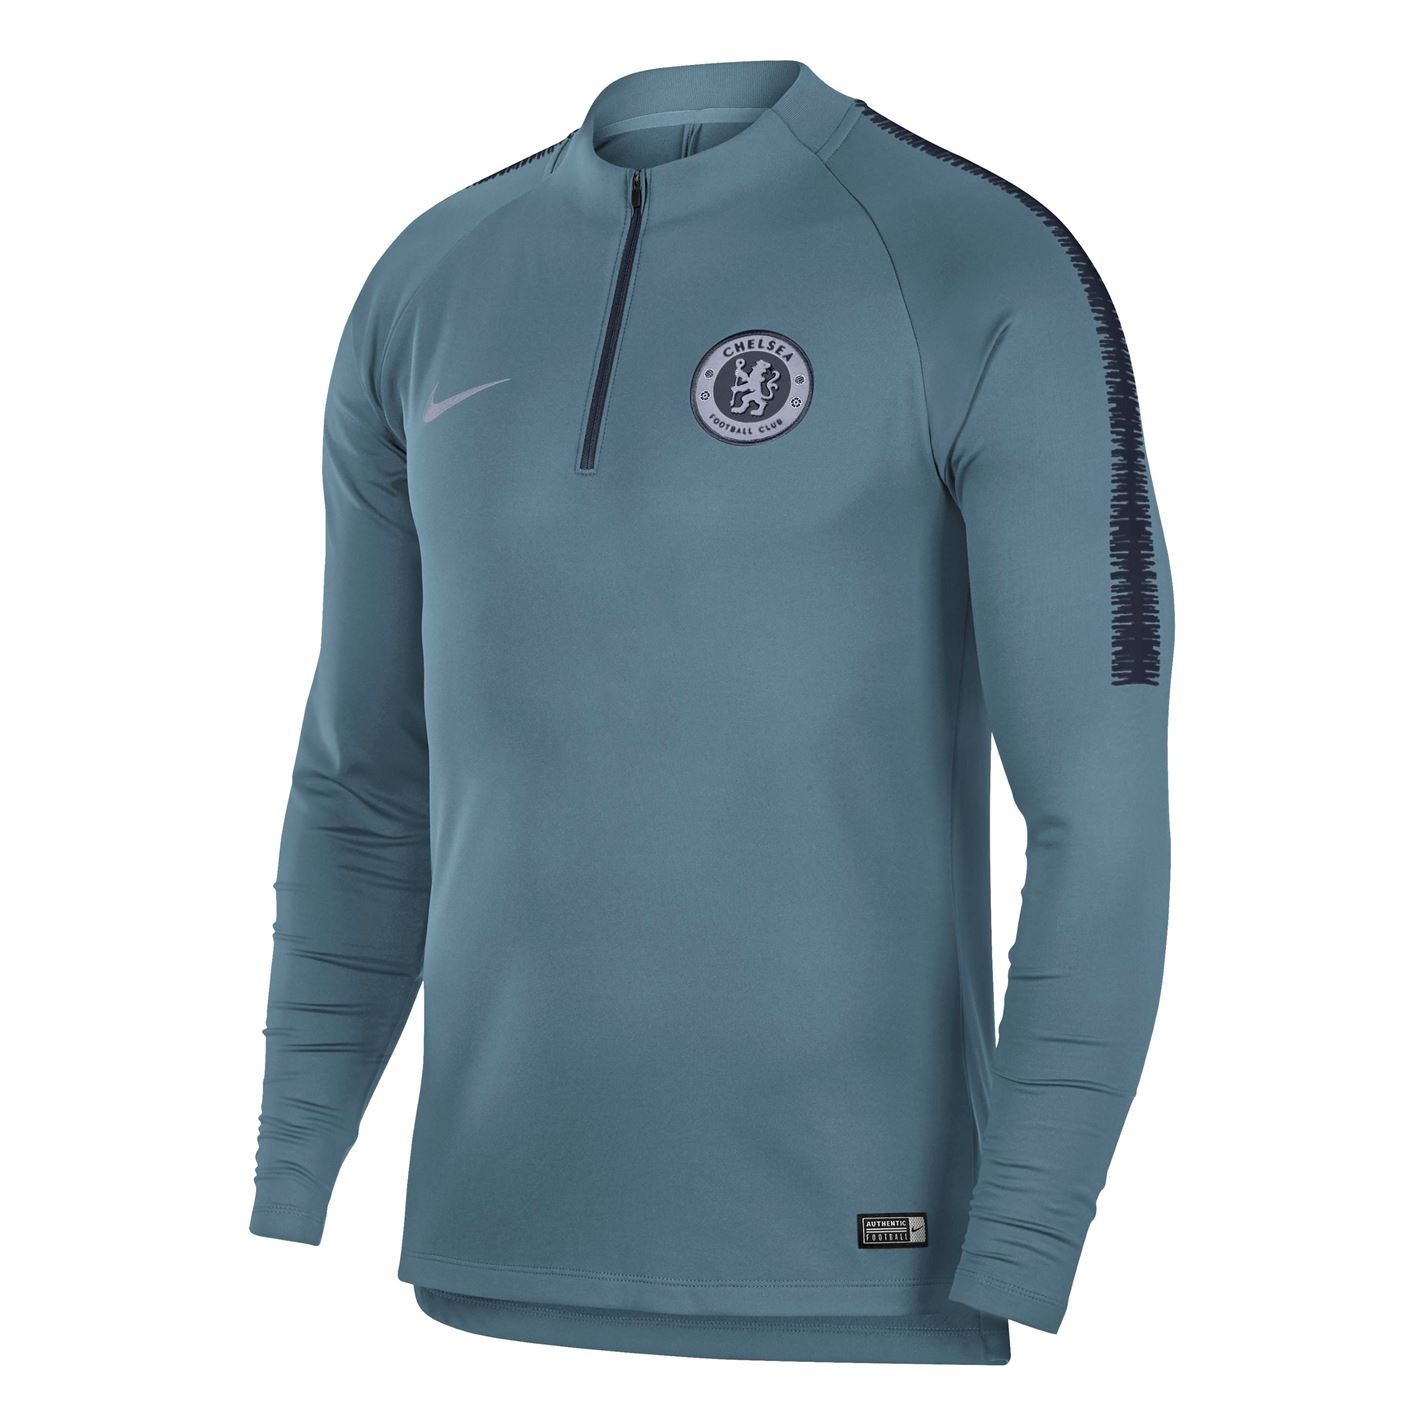 7dadf7296 Nike Chelsea Squad Drill Top 2018 2019 Mens Football Soccer Sweatshirt